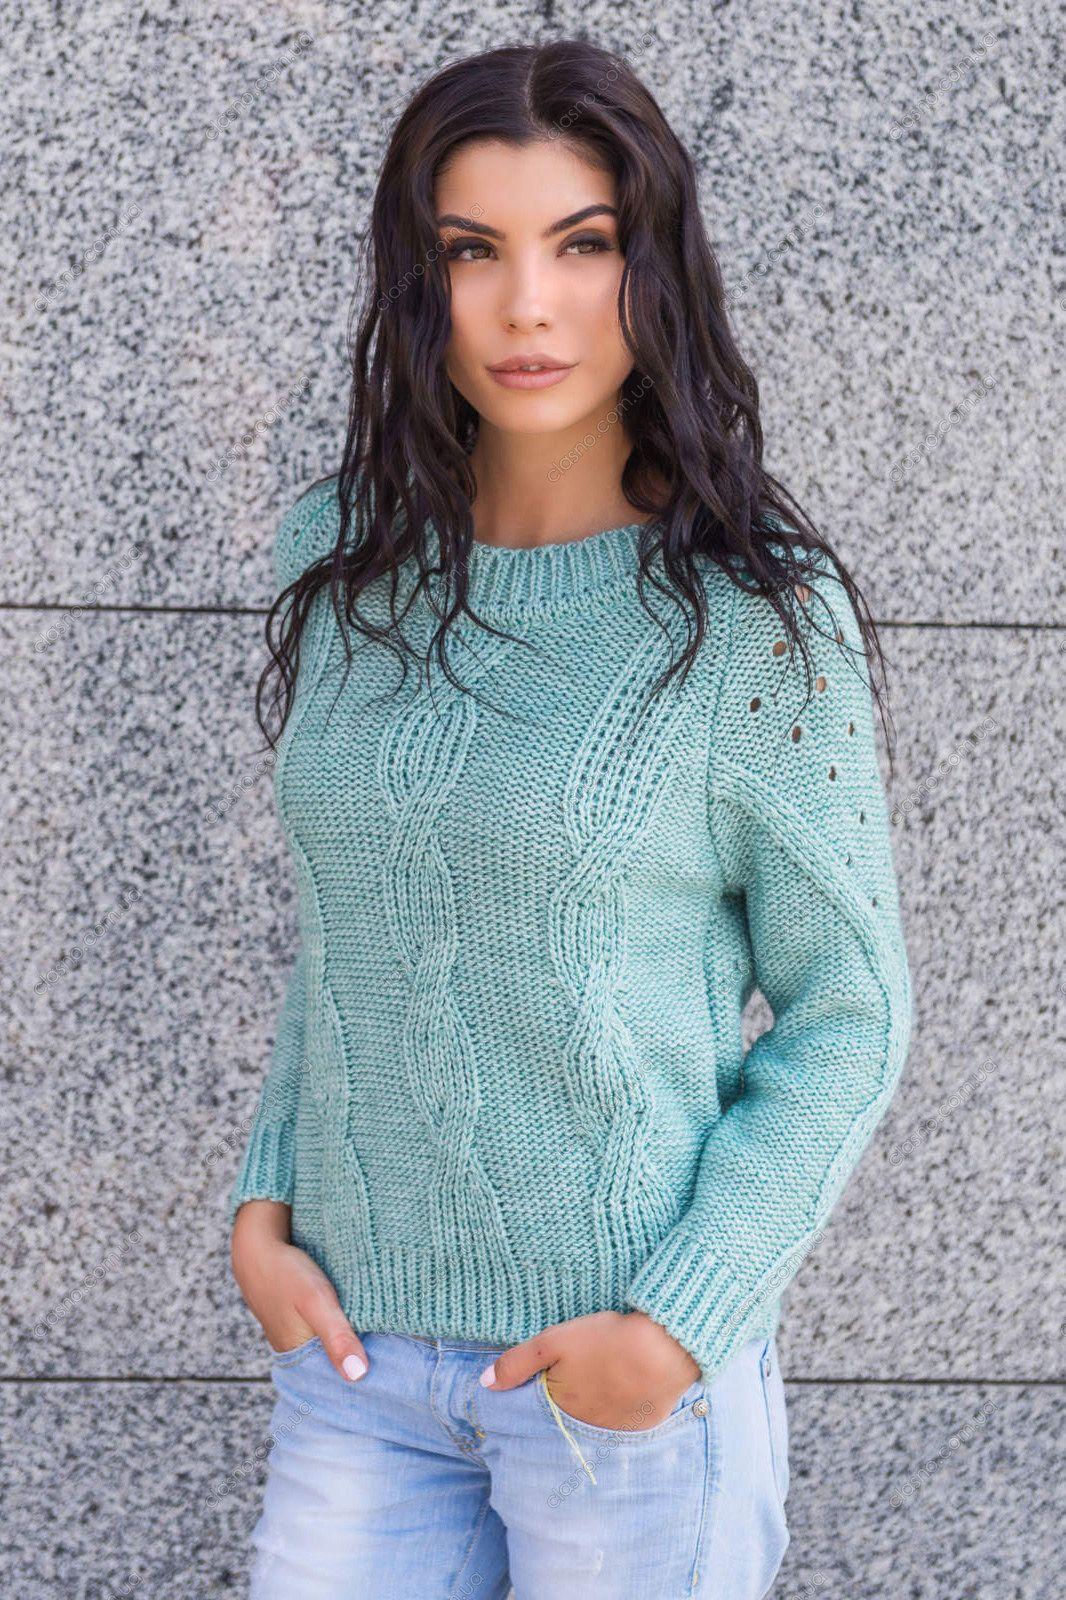 f173a4689a2c Вязаный женский свитер (121 фото) 2017: крупной вязки, модели ...